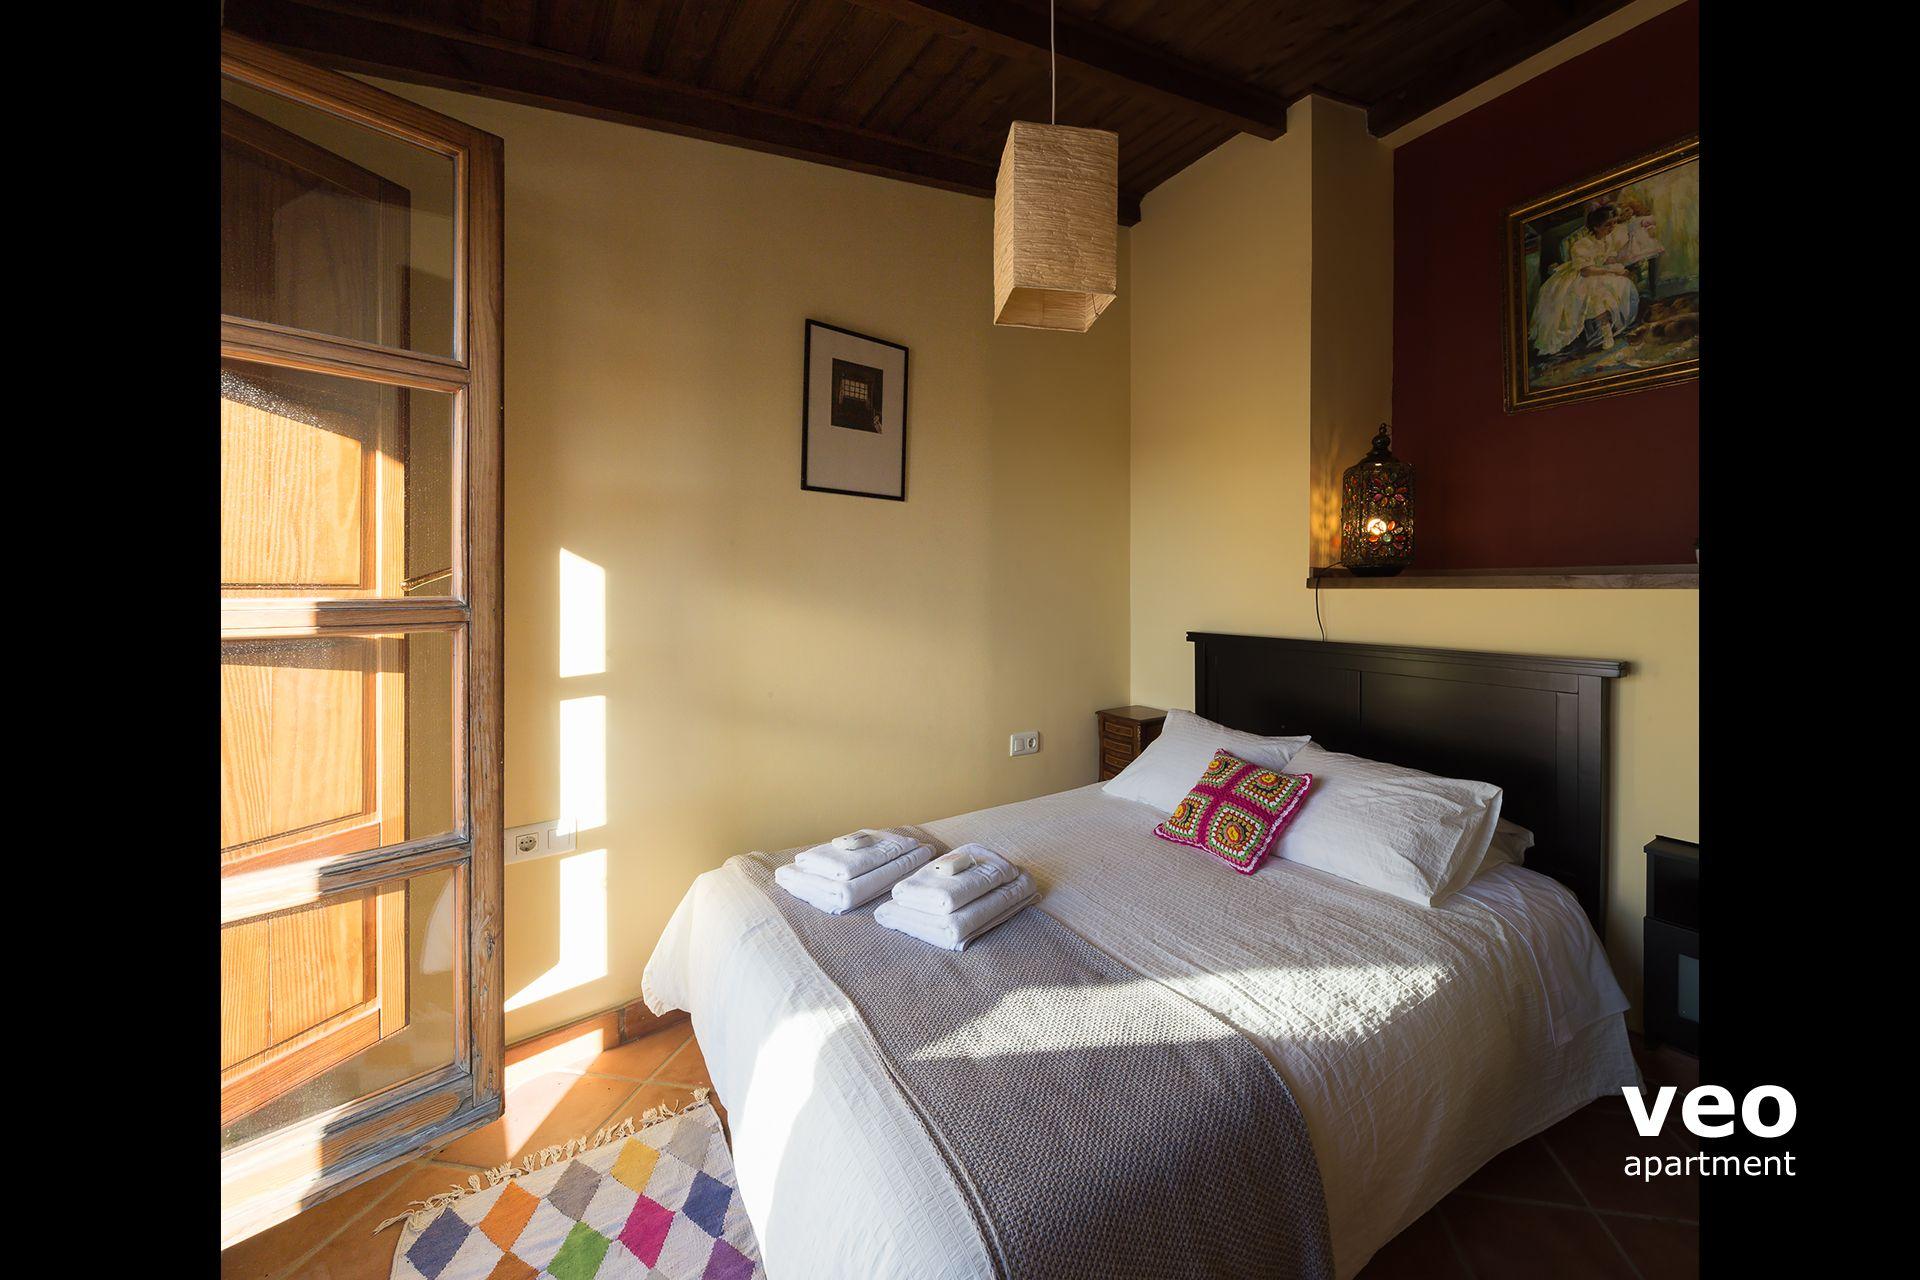 Sevilla apartmento calle san felipe sevilla espa a san for Registro bienes muebles sevilla